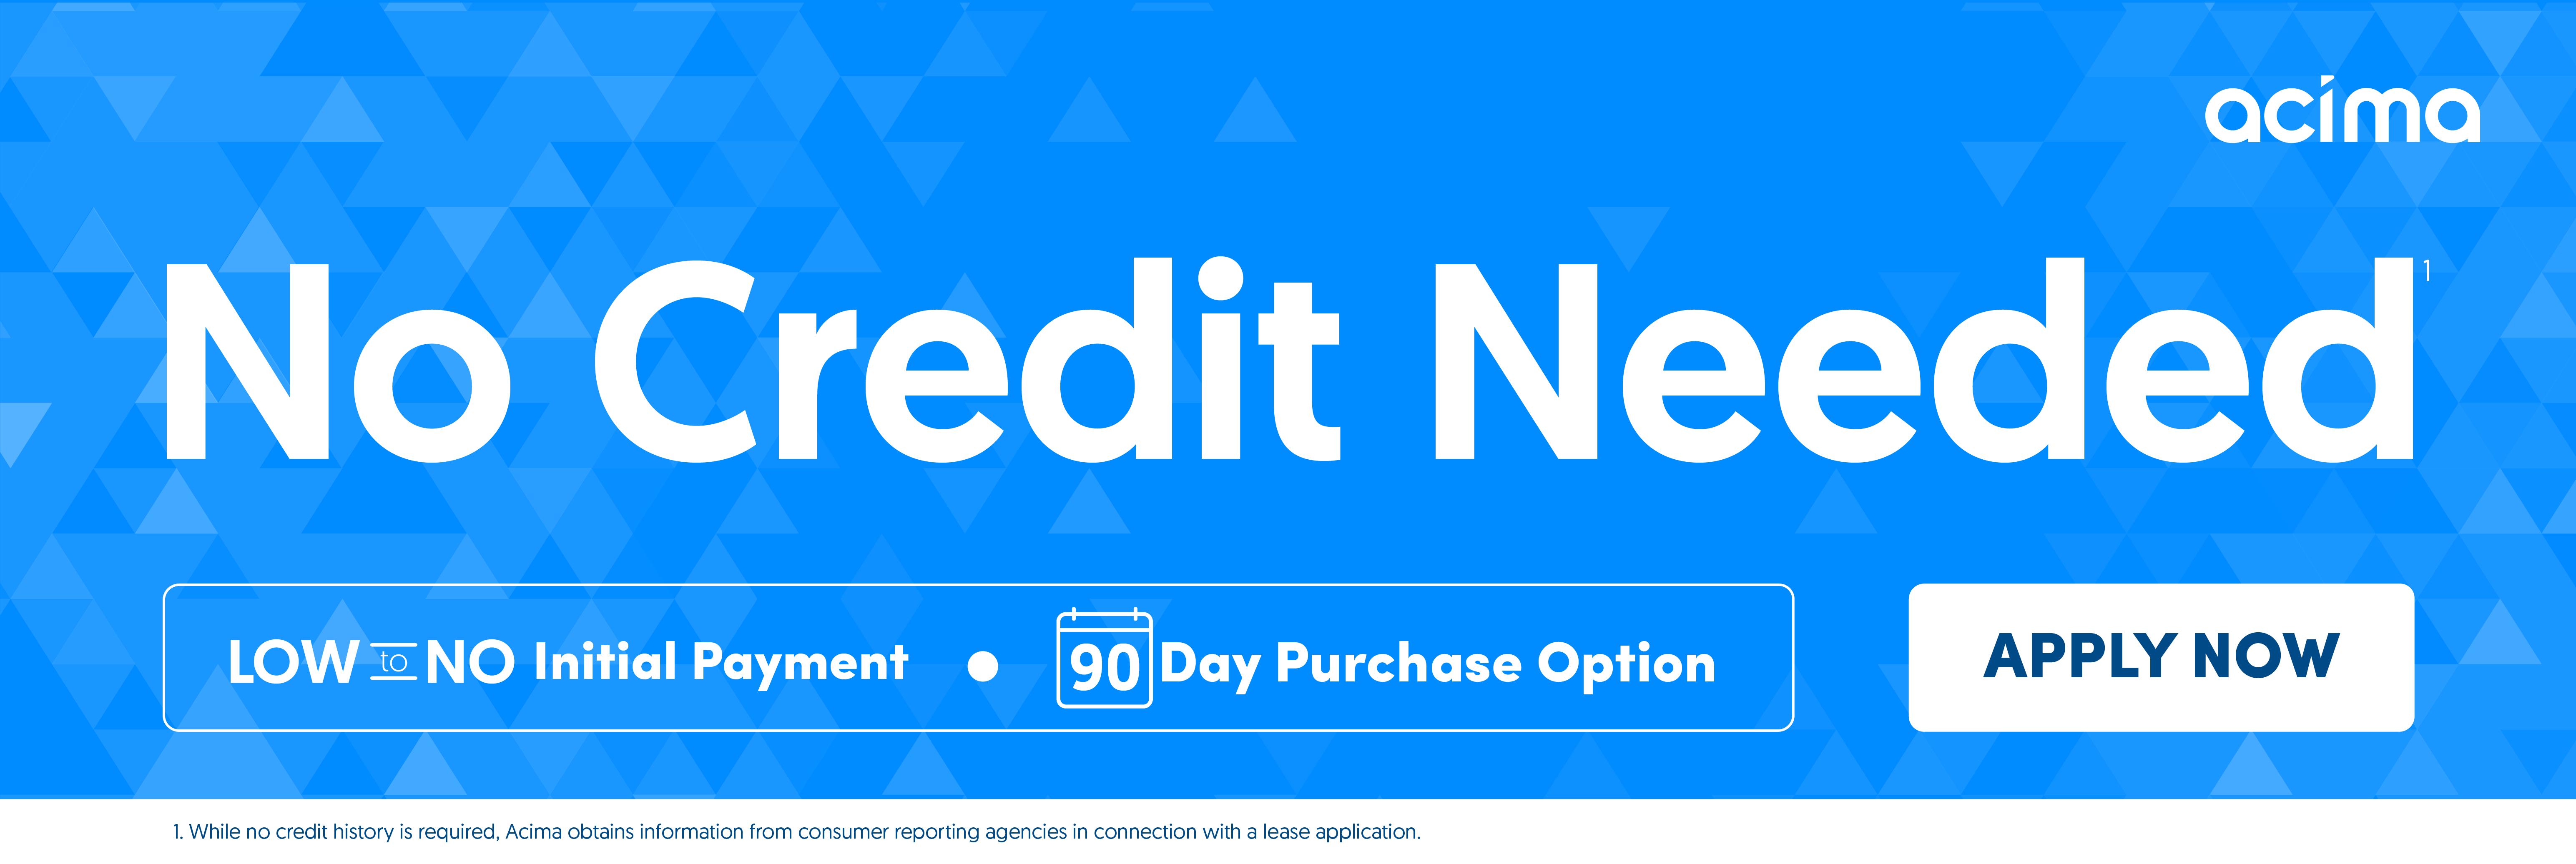 Acima - No Credit Needed!